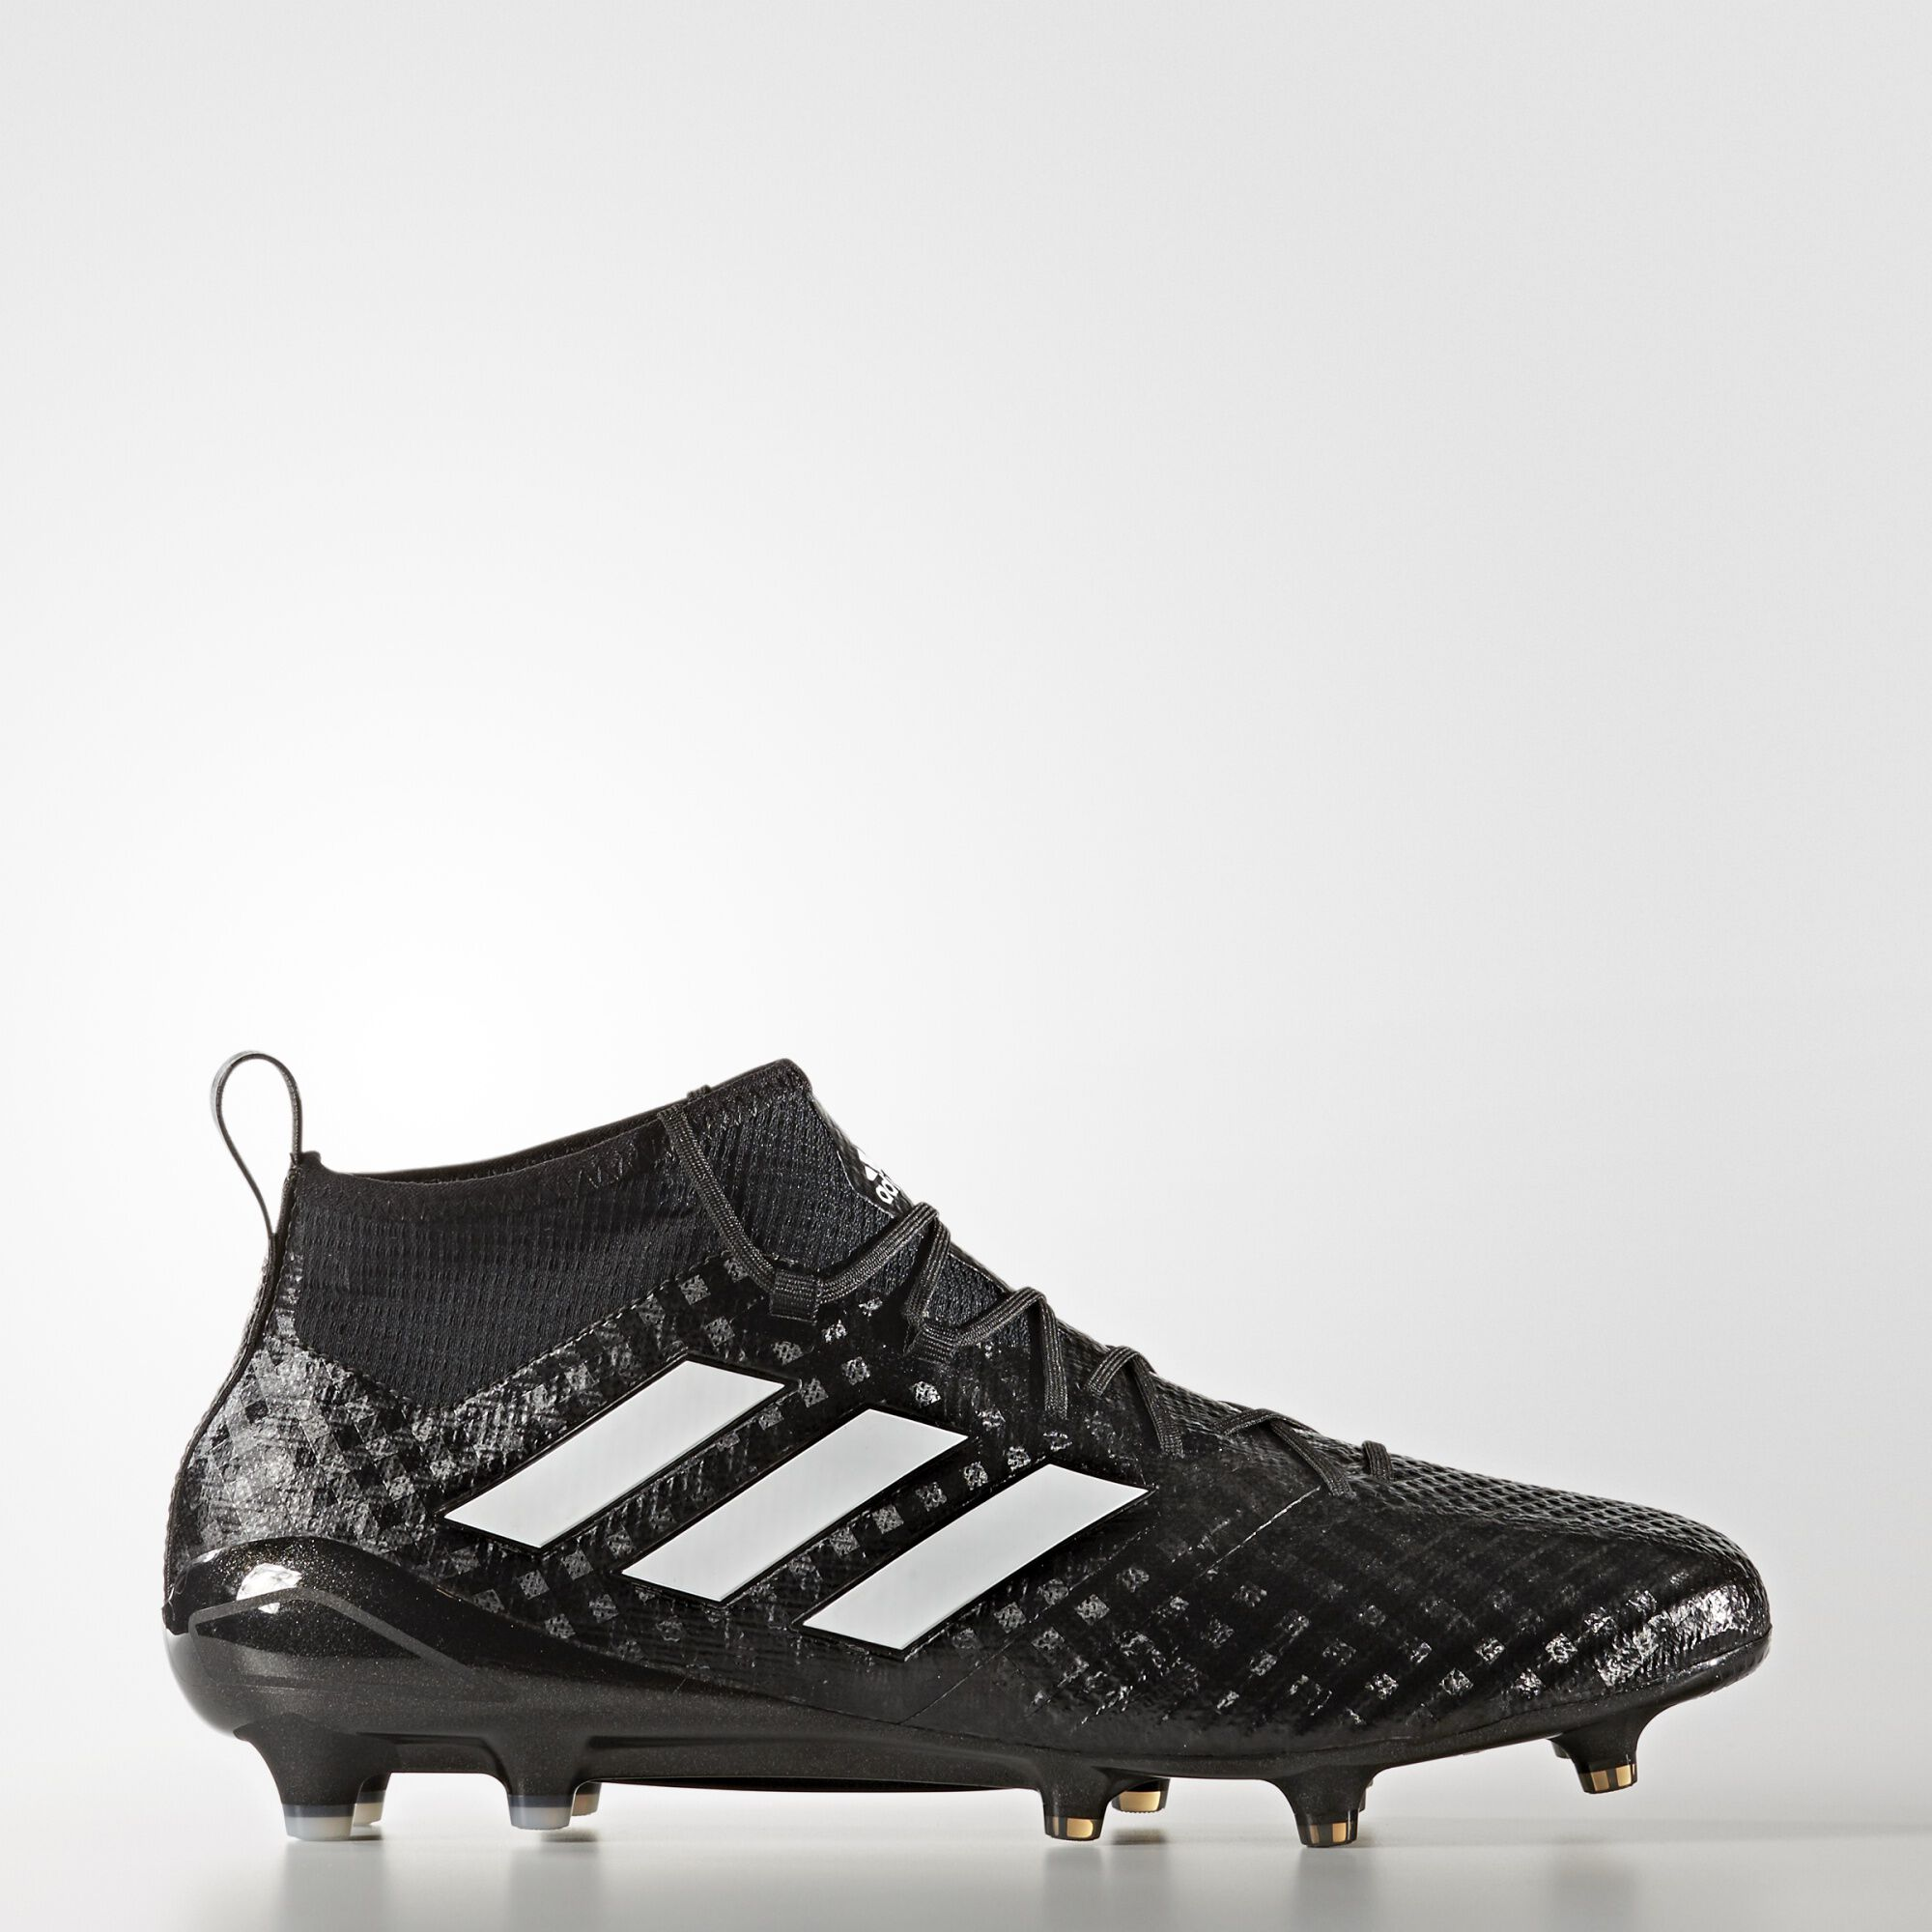 Adidas Ace 17.1 Black